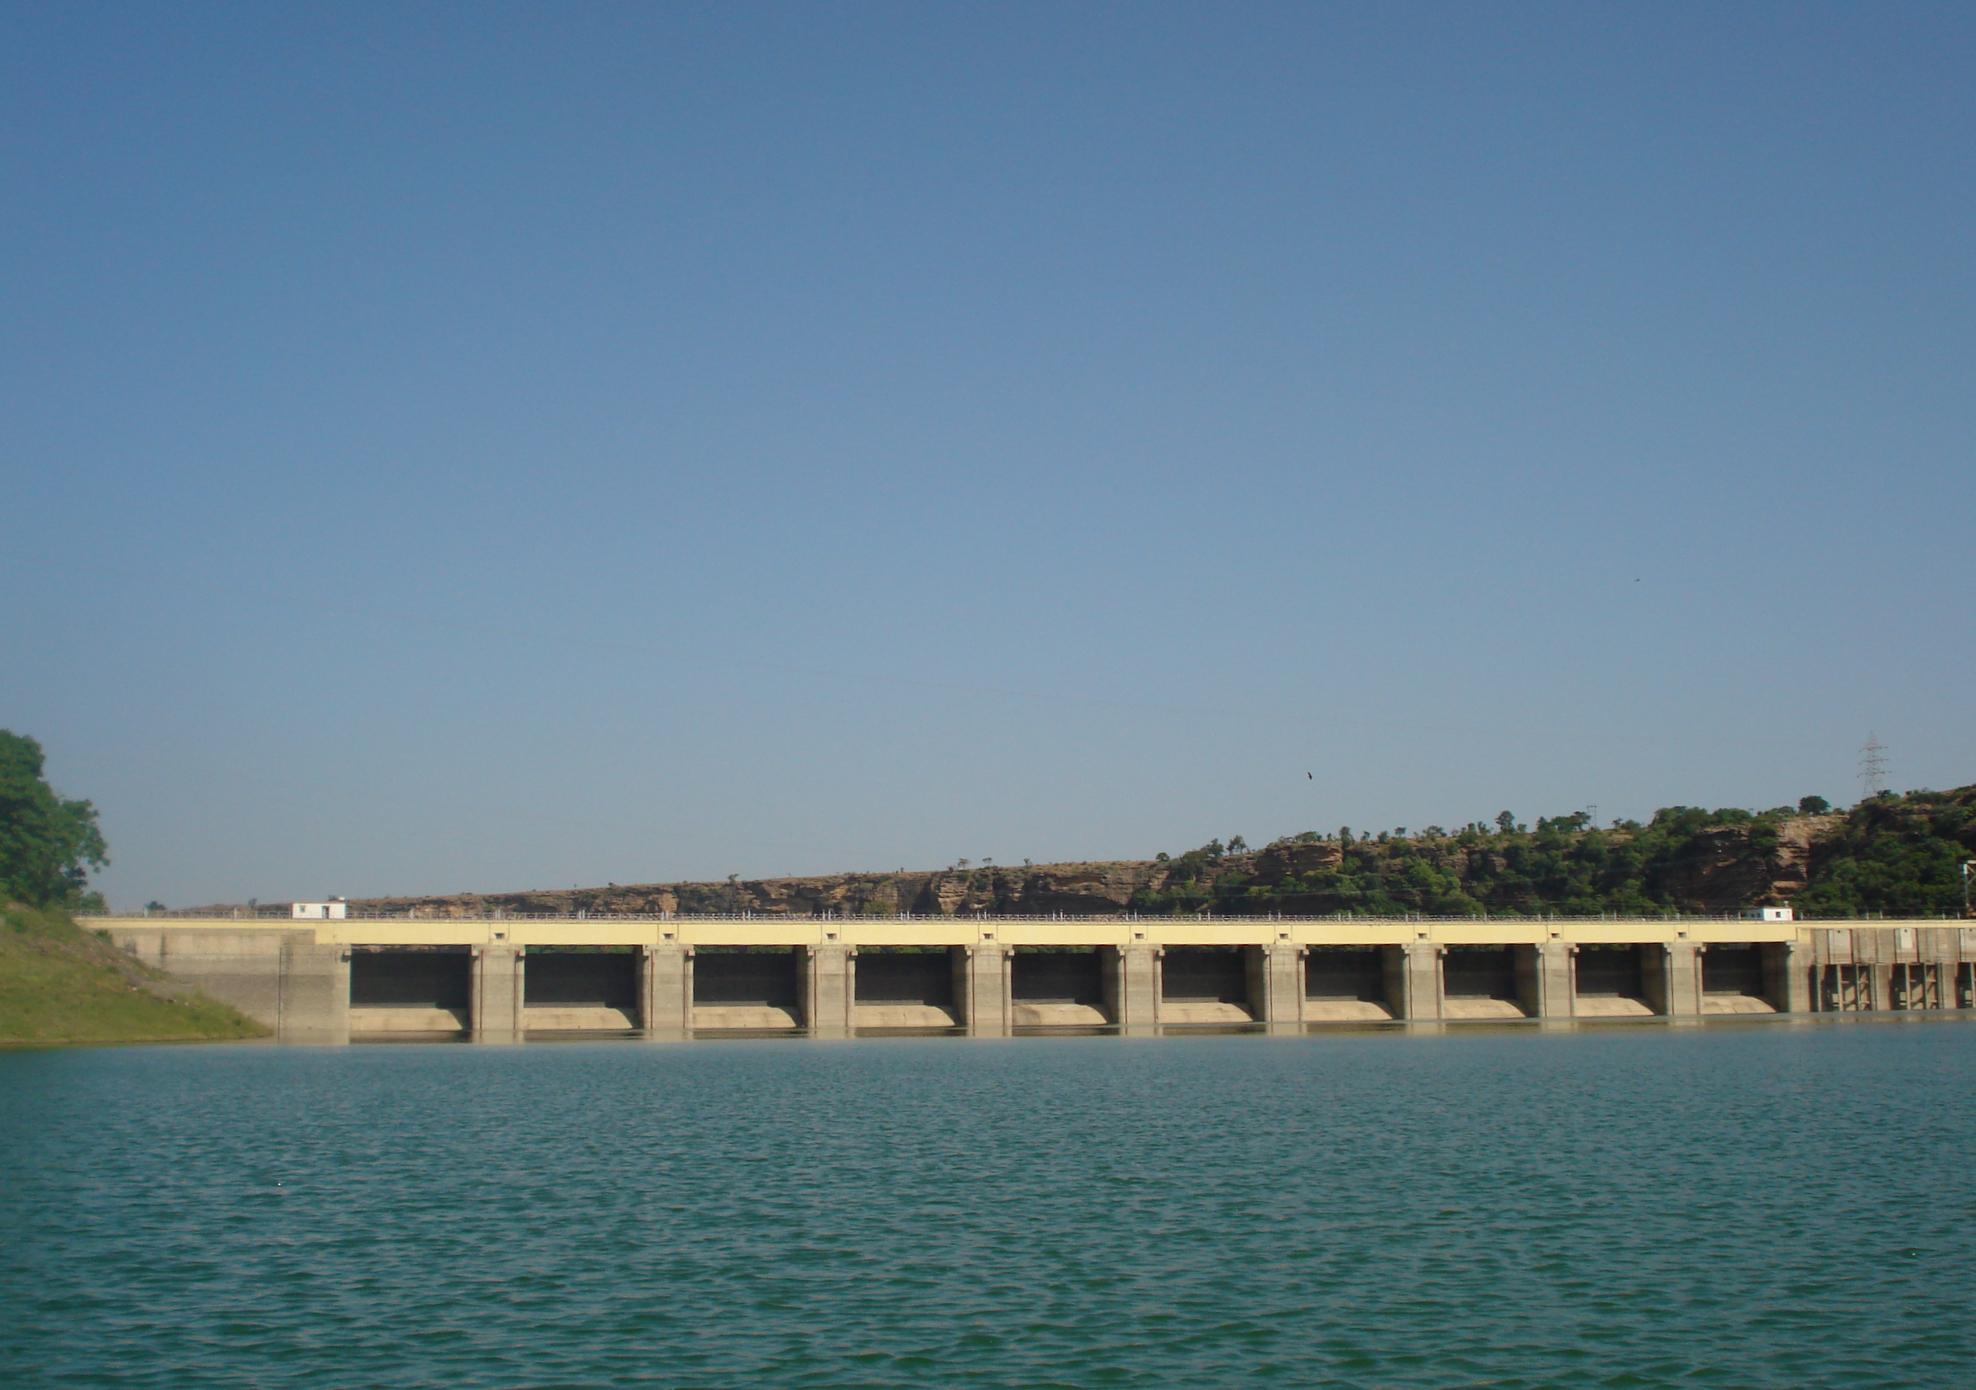 Dam to Dam 2009 Photos Gandhi Sagar Dam in 2009